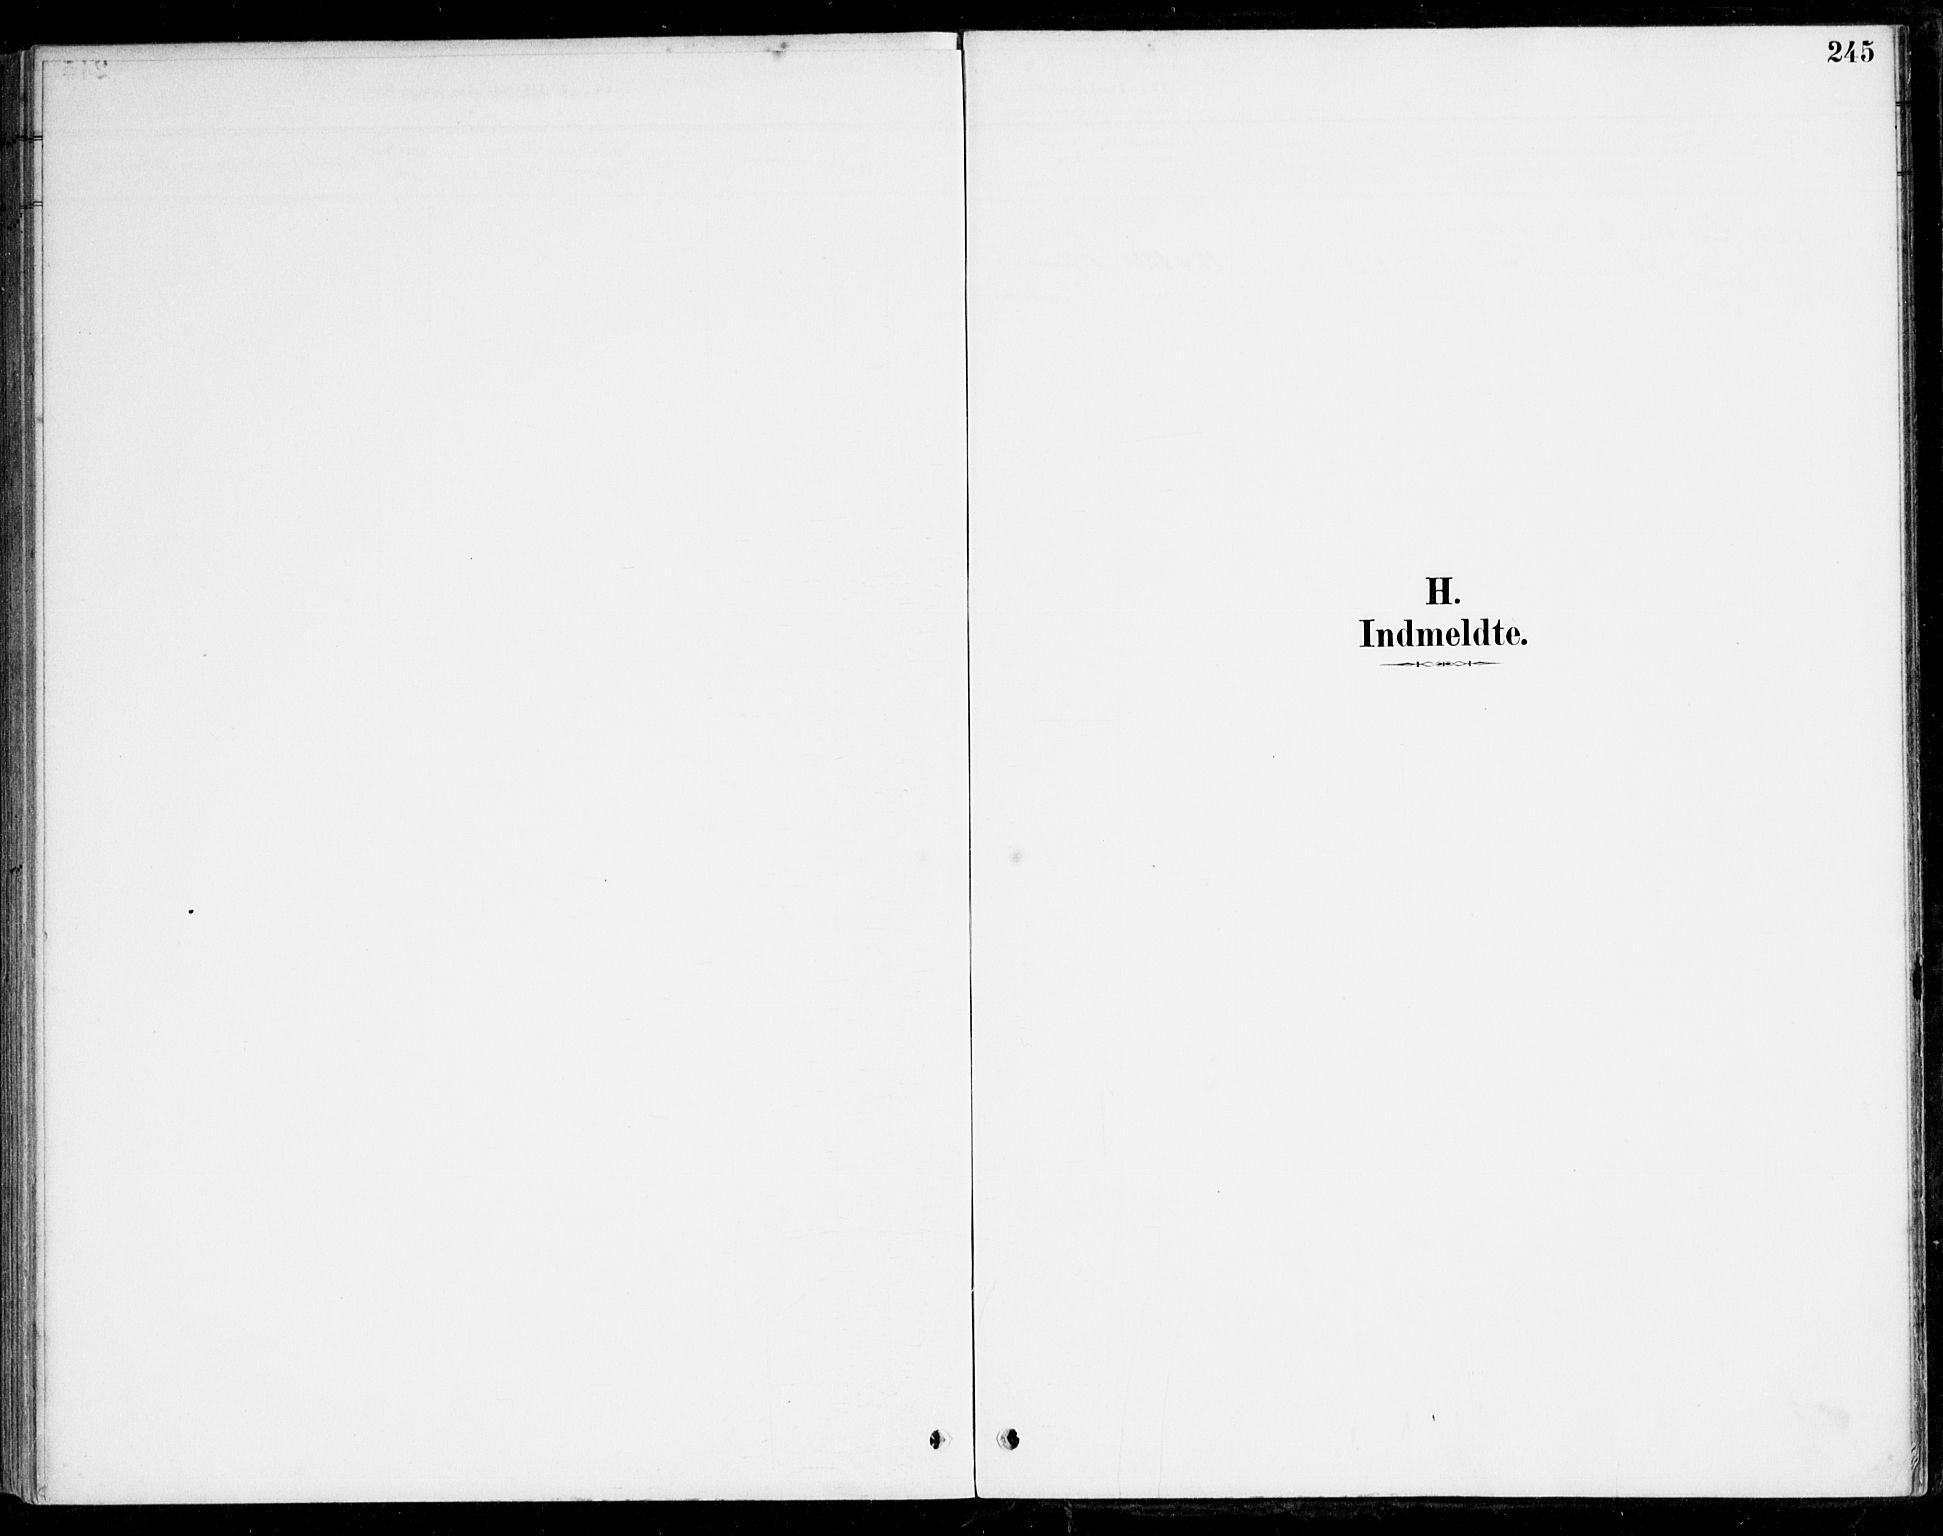 SAK, Herad sokneprestkontor, F/Fa/Fab/L0005: Parish register (official) no. A 5, 1886-1913, p. 245